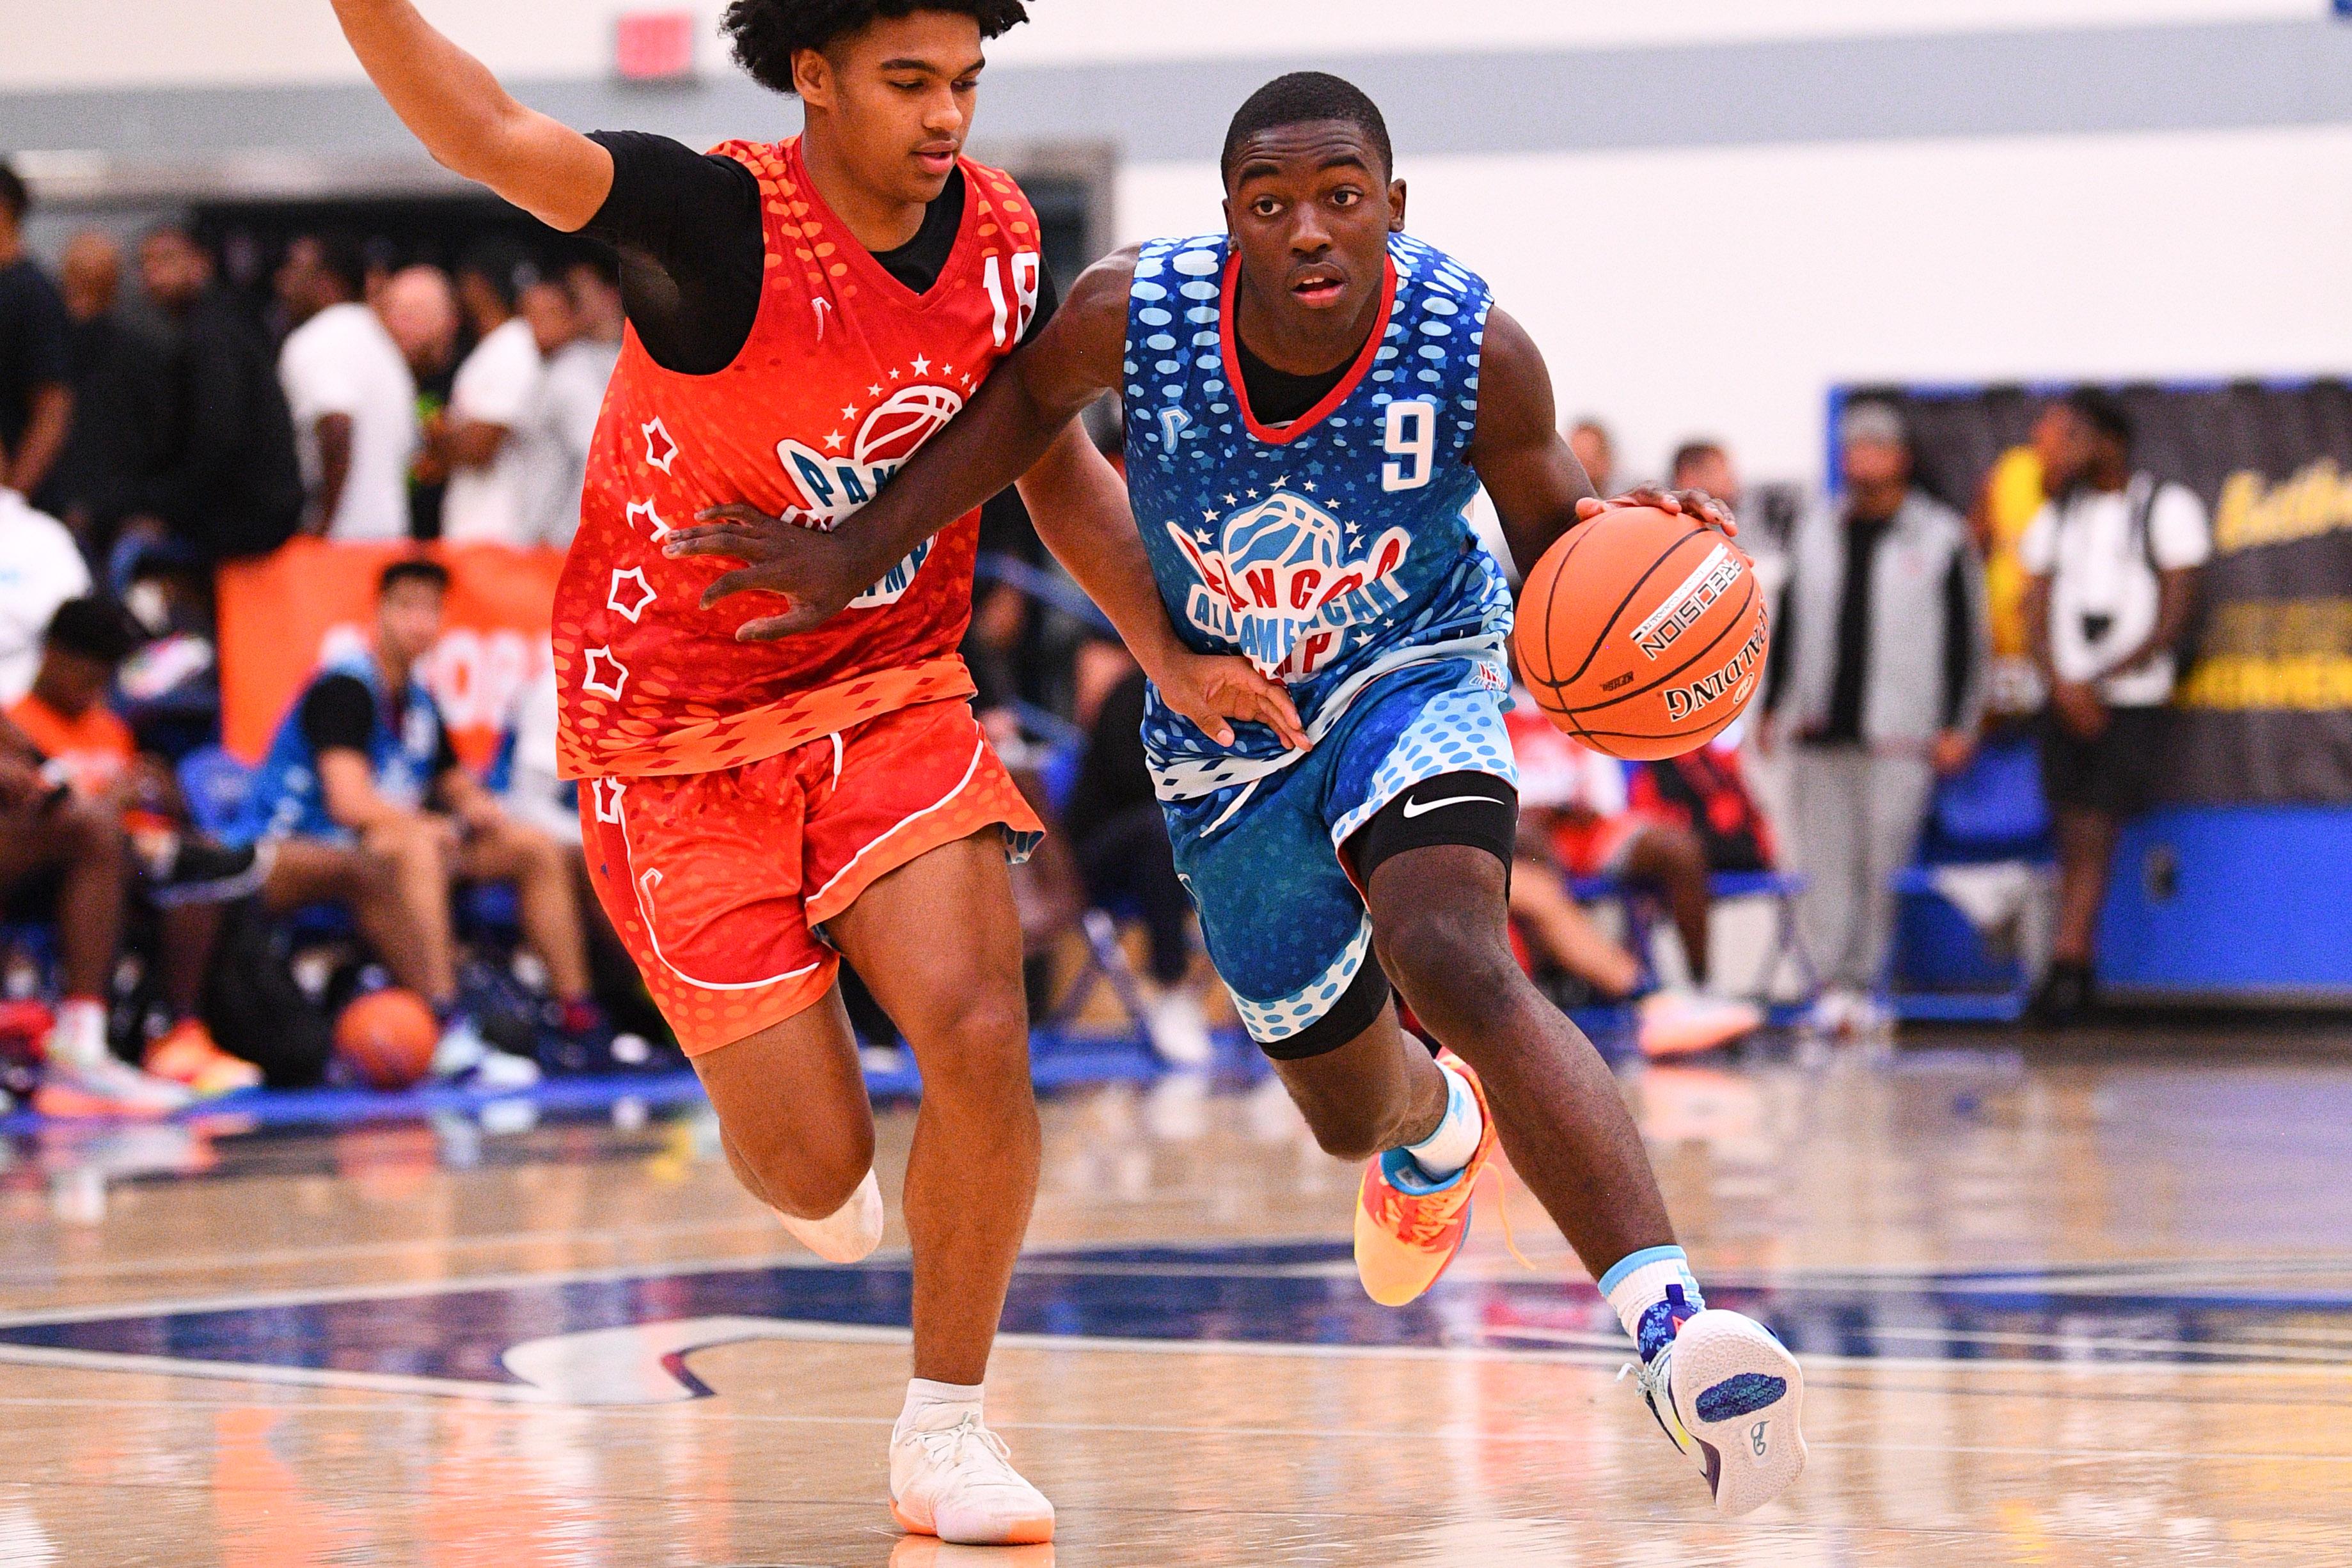 High School Basketball: JUN 02 Pangos All-American Camp